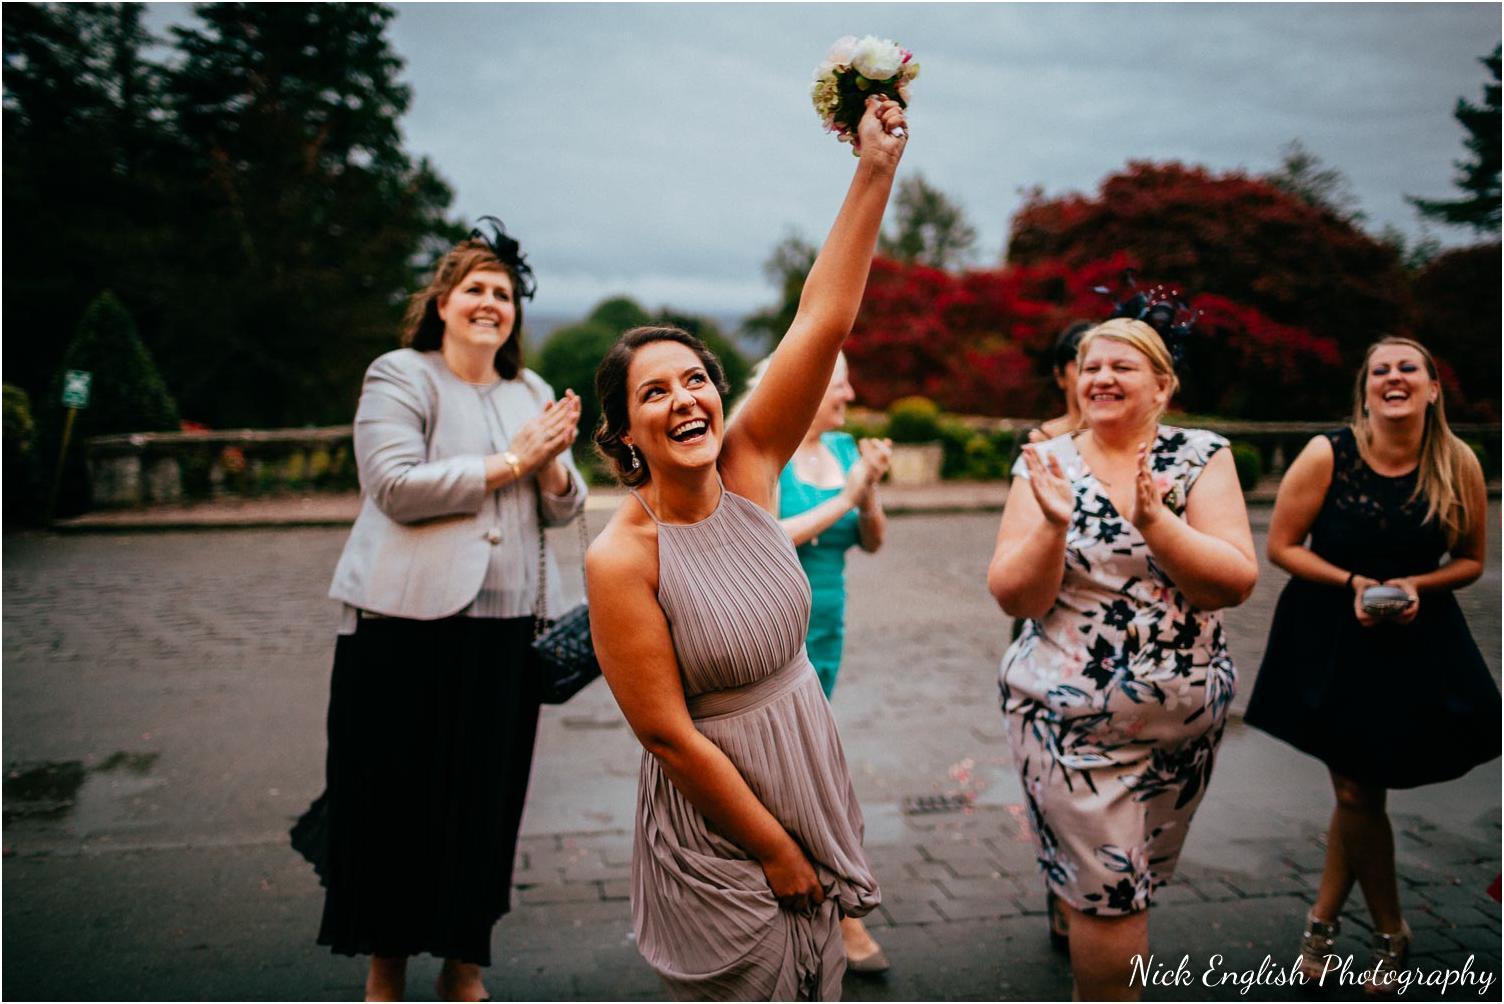 Lancashire_Wedding_Photographer-1-18.jpg